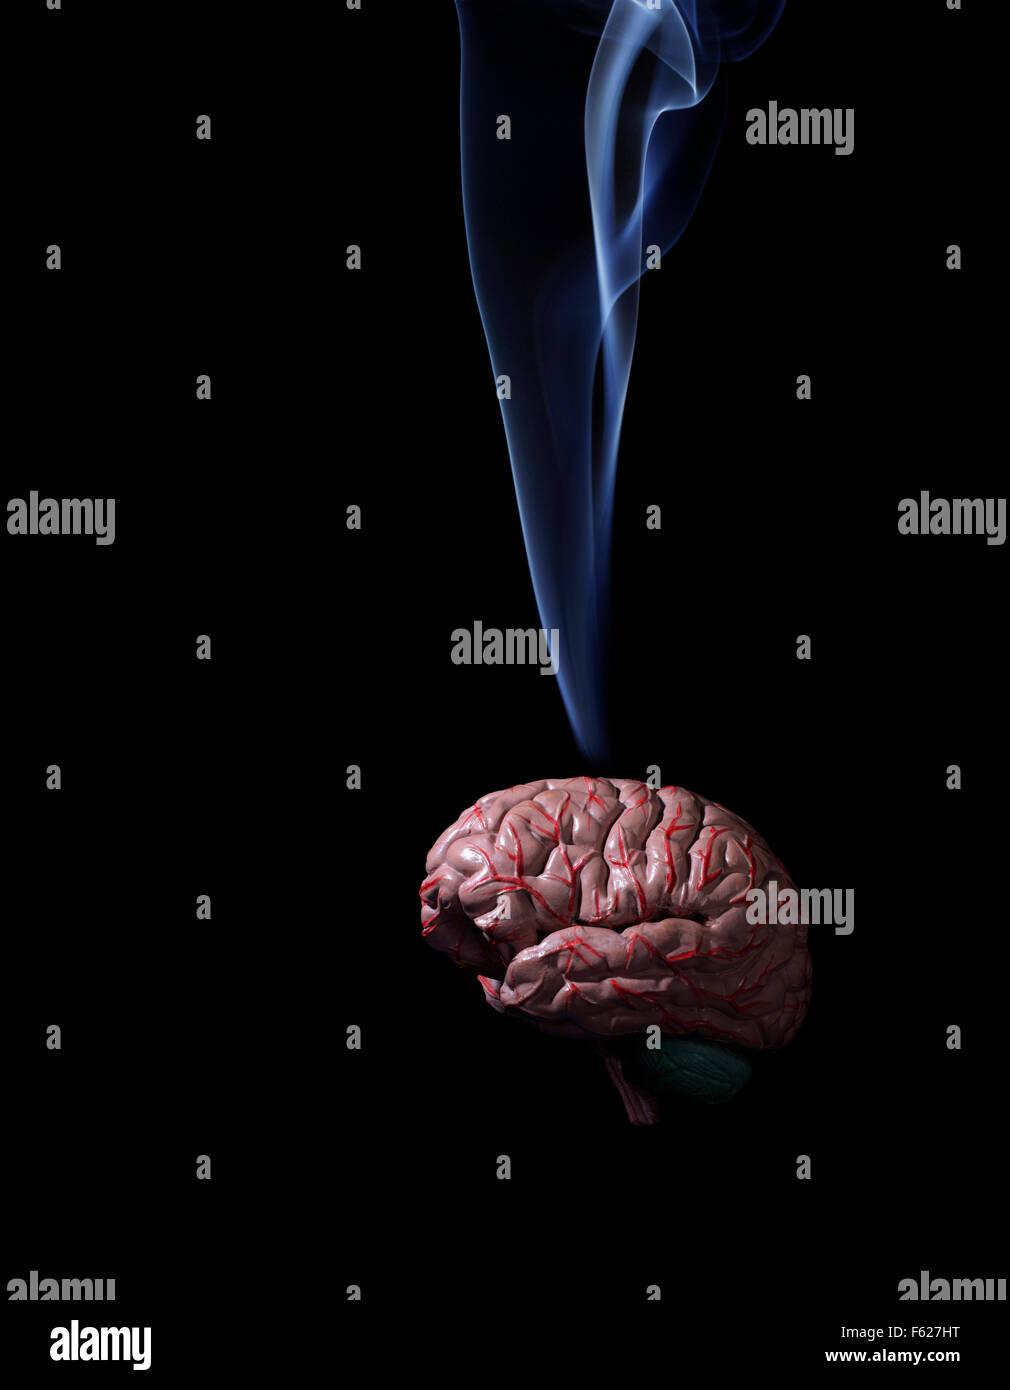 Studio shot of smoke rising from human brain - Stock Image